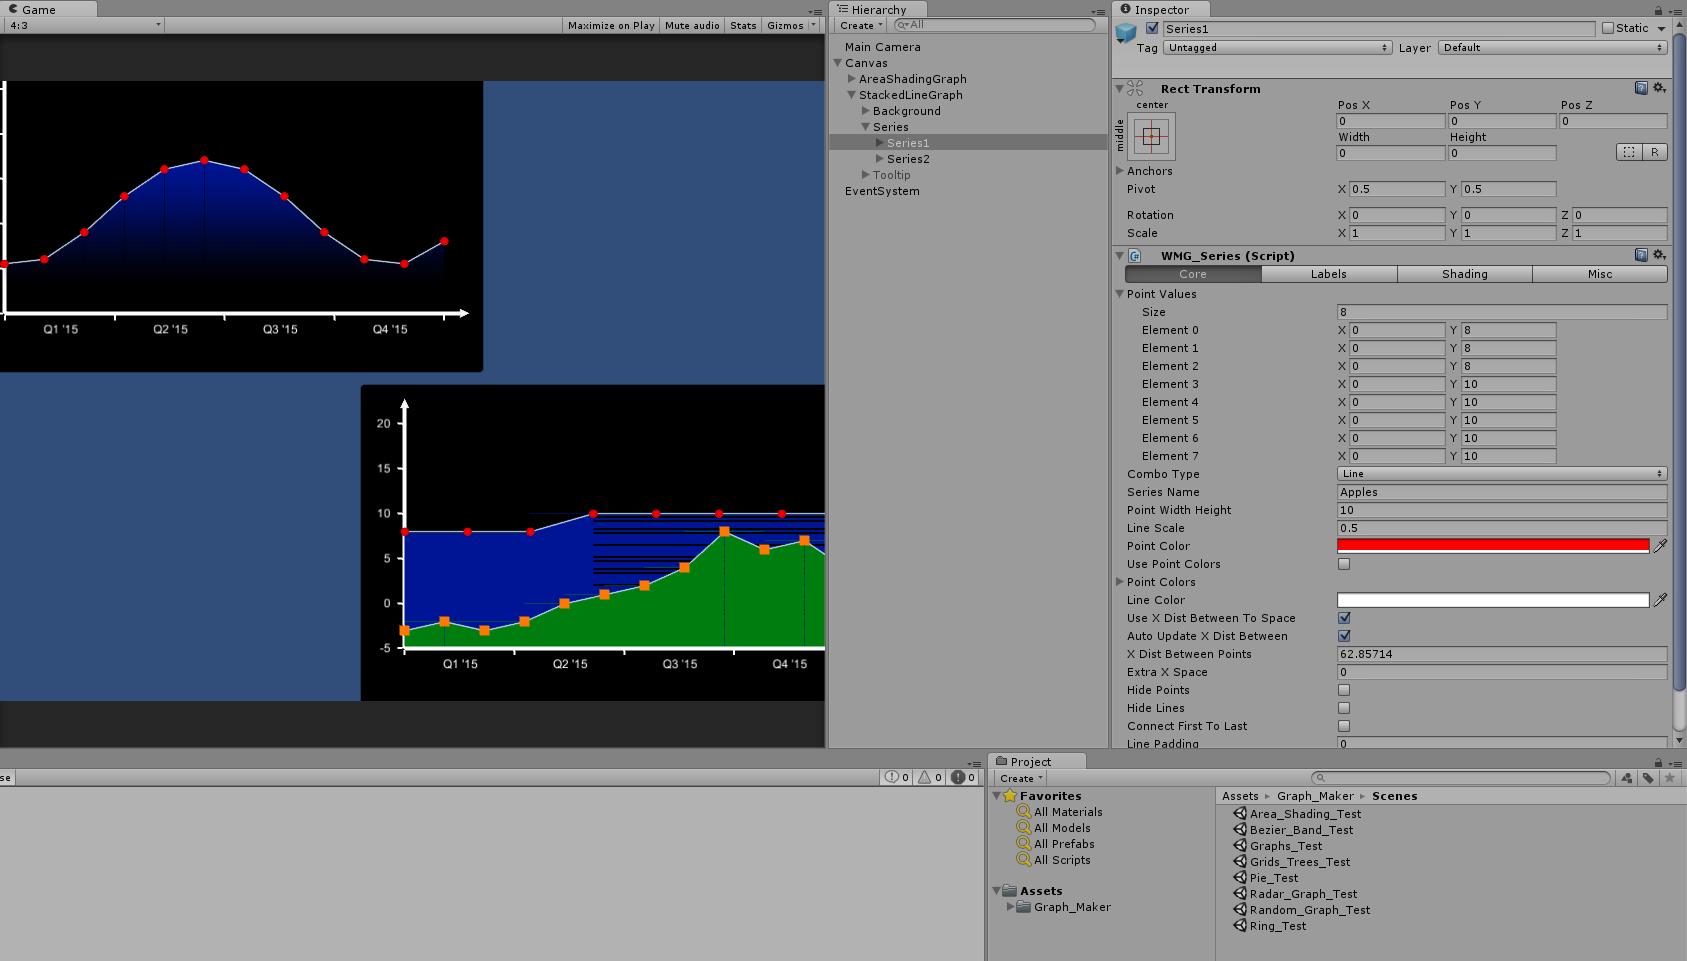 AreaShadingTest_Screenshot1.PNG